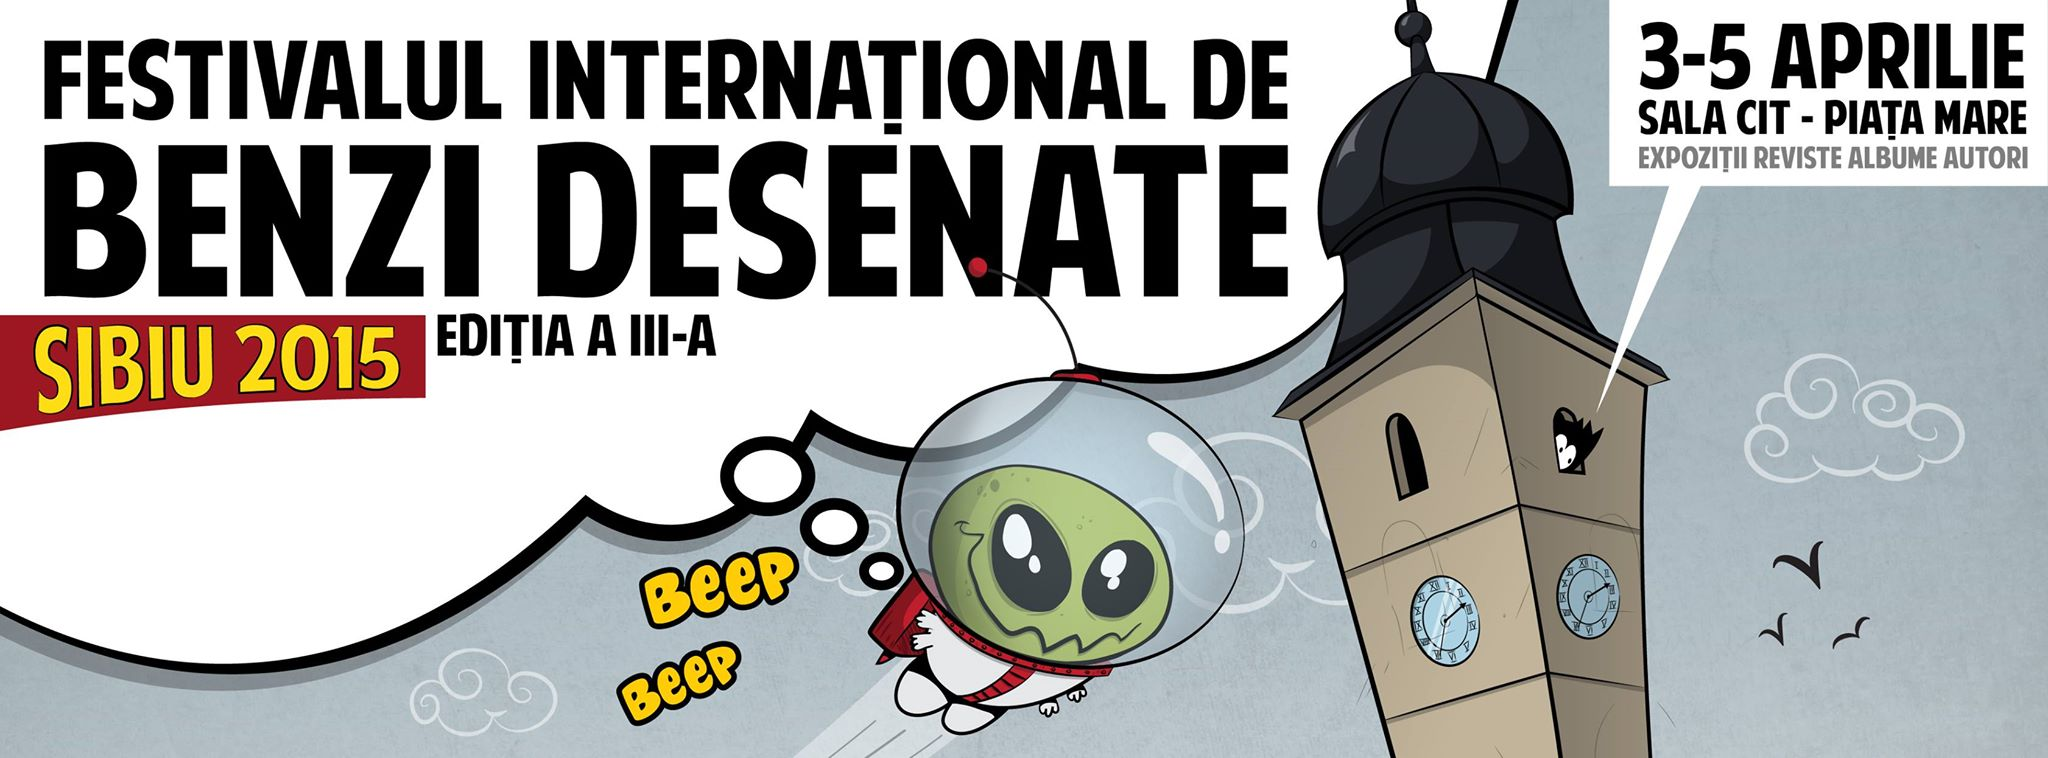 Festival International de Benzi Desenate din Sibiu, editia a III-a